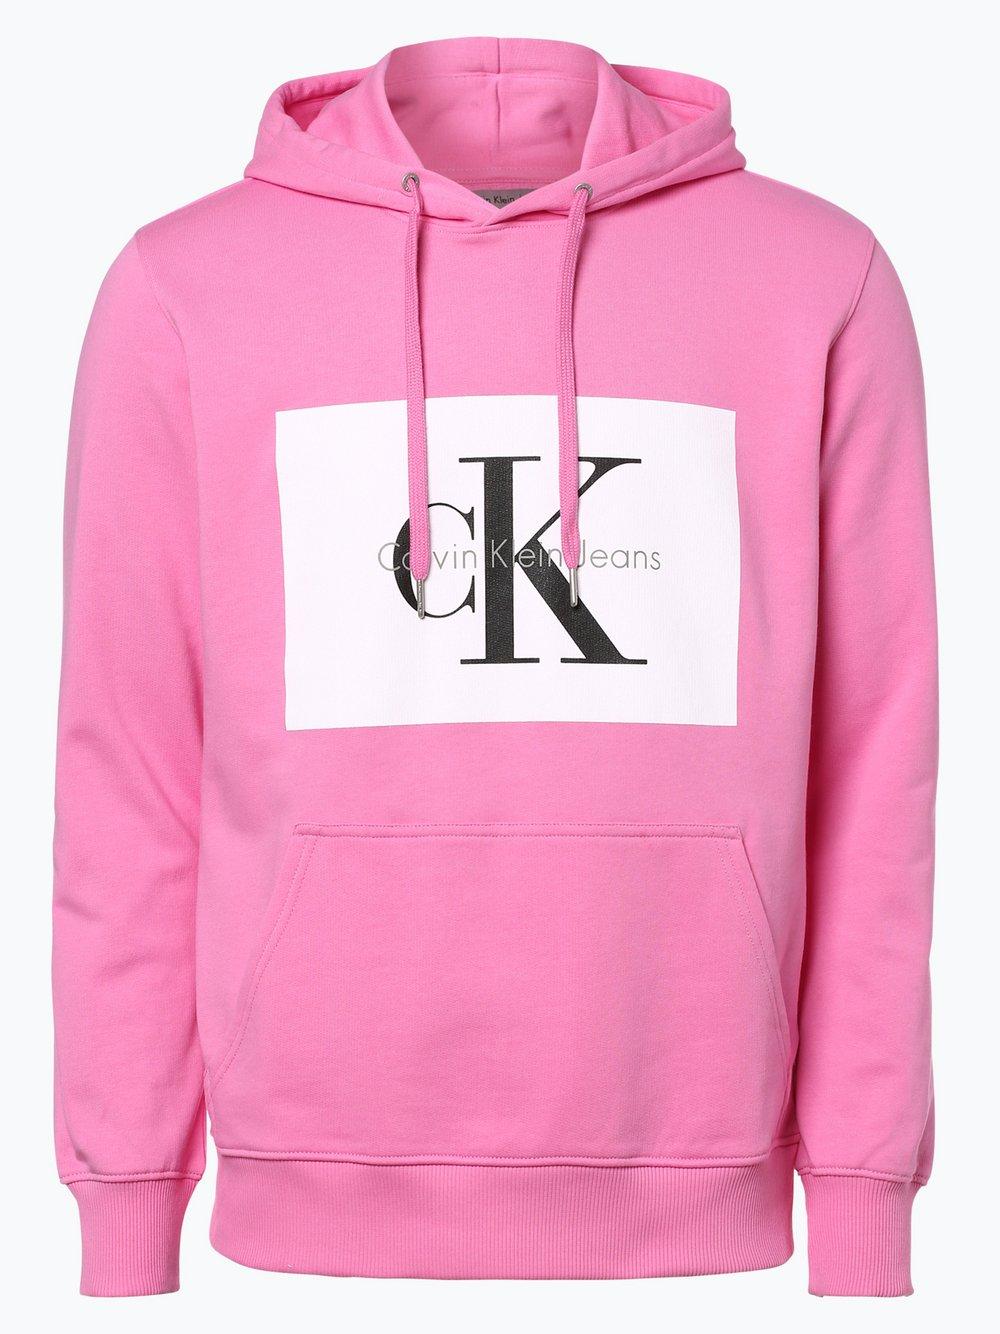 Calvin Klein Jeans Herren Sweatshirt online kaufen